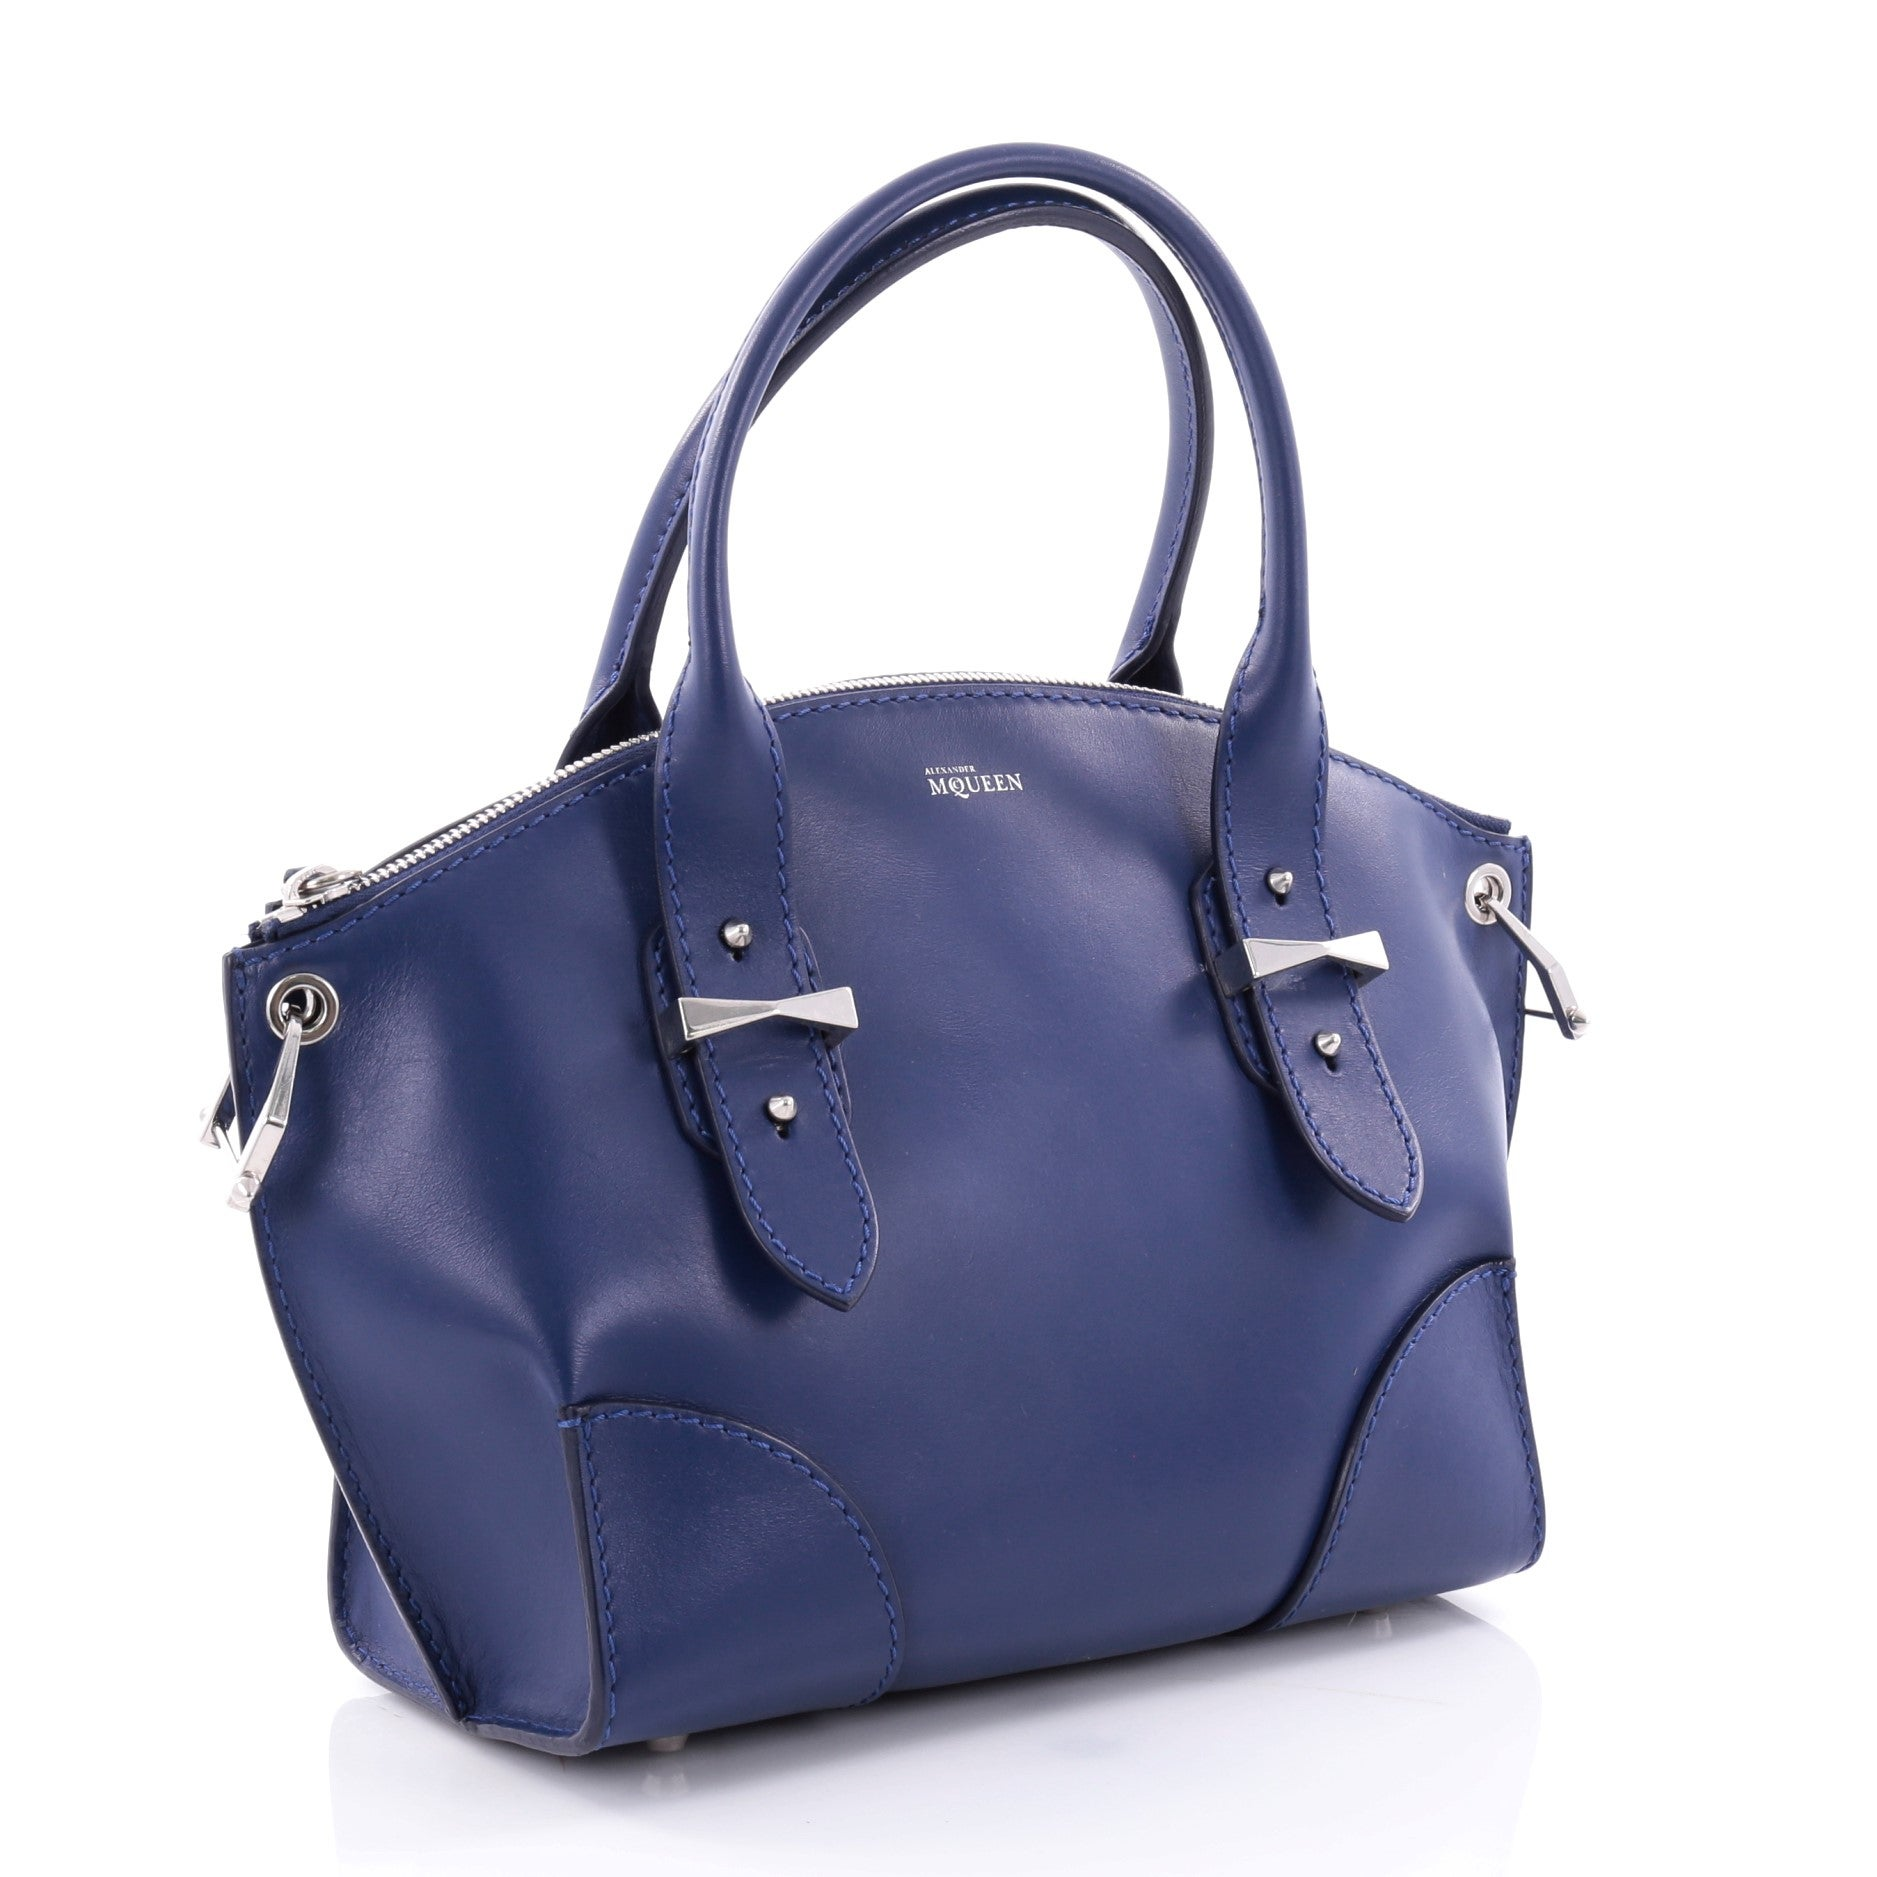 Alexander McQueen Alexander Mcqueen Legend Convertible Satchel Leather Small B4F8D